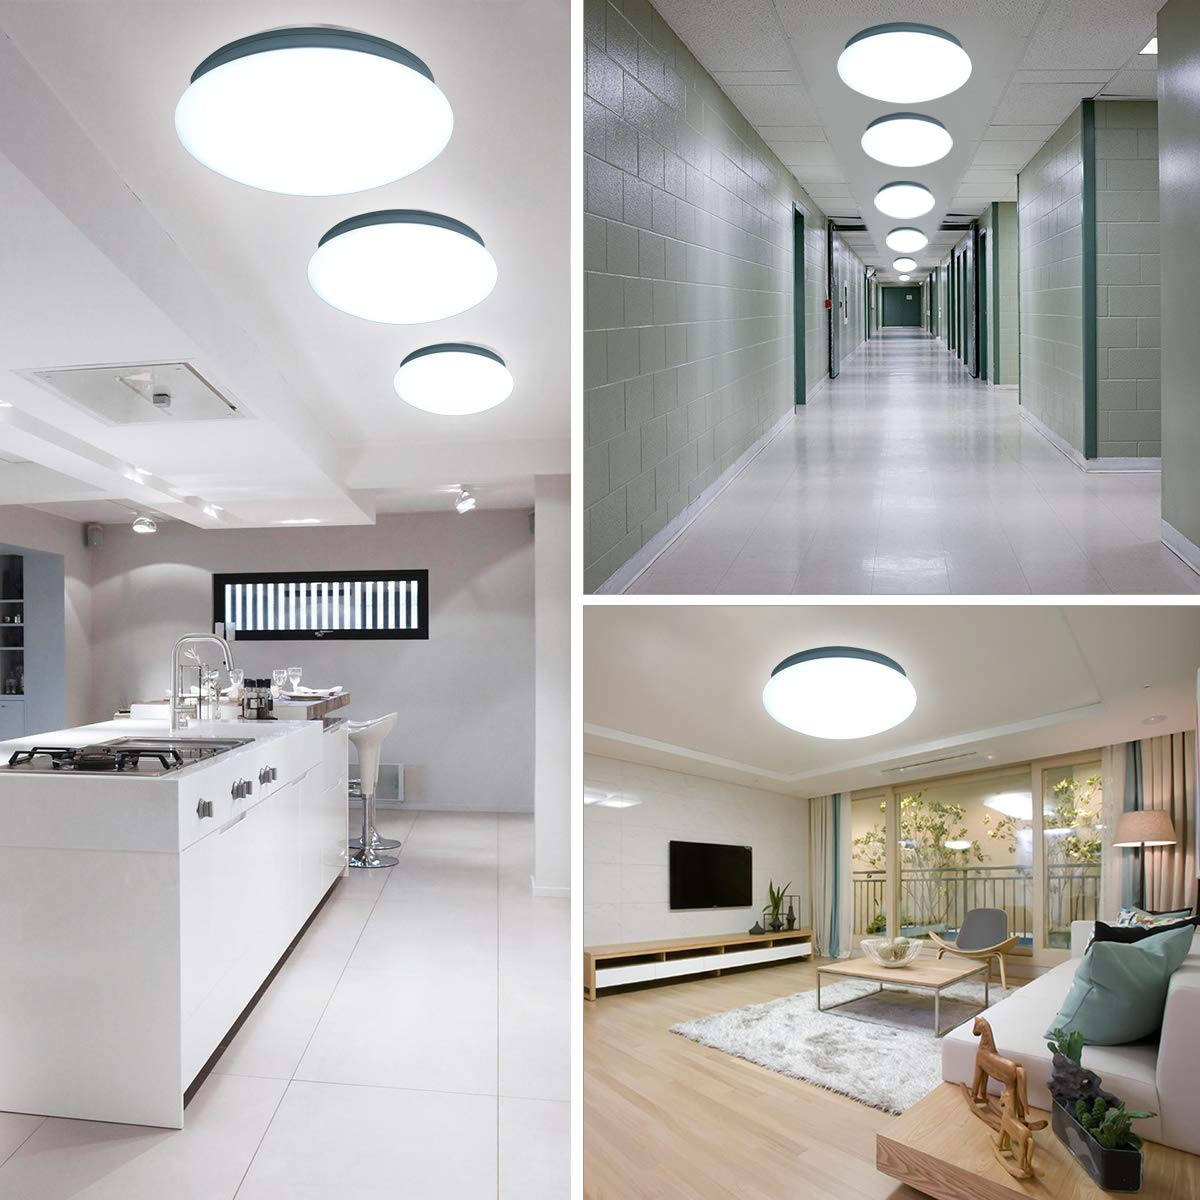 10 inch Led Ceiling Light Fixture 6000K Daylight Lighting,100W Equivalent,1200 LM,Mushroom Shape,12W Flush Mount Led Ceiling Lights for Home, Foyers, Restroom, Closet, Attic, Basement, Garage